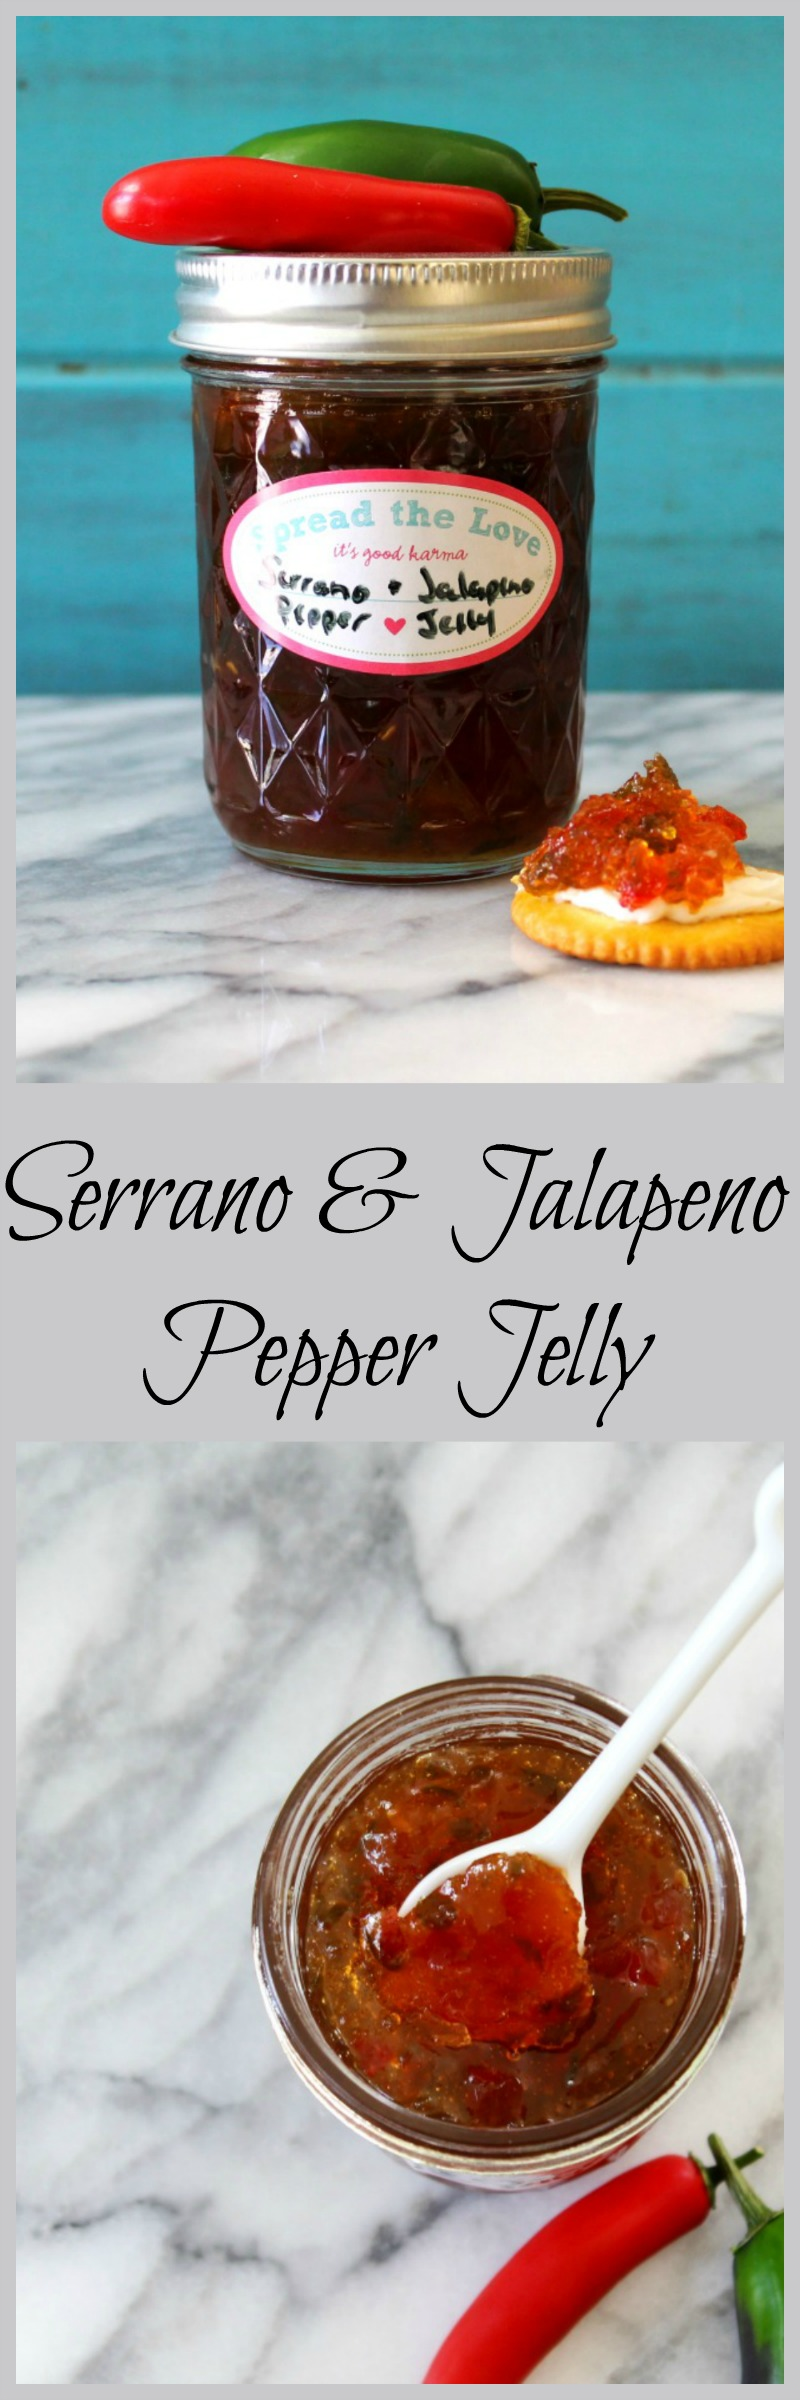 Serrano & Jalapeno Pepper Jelly